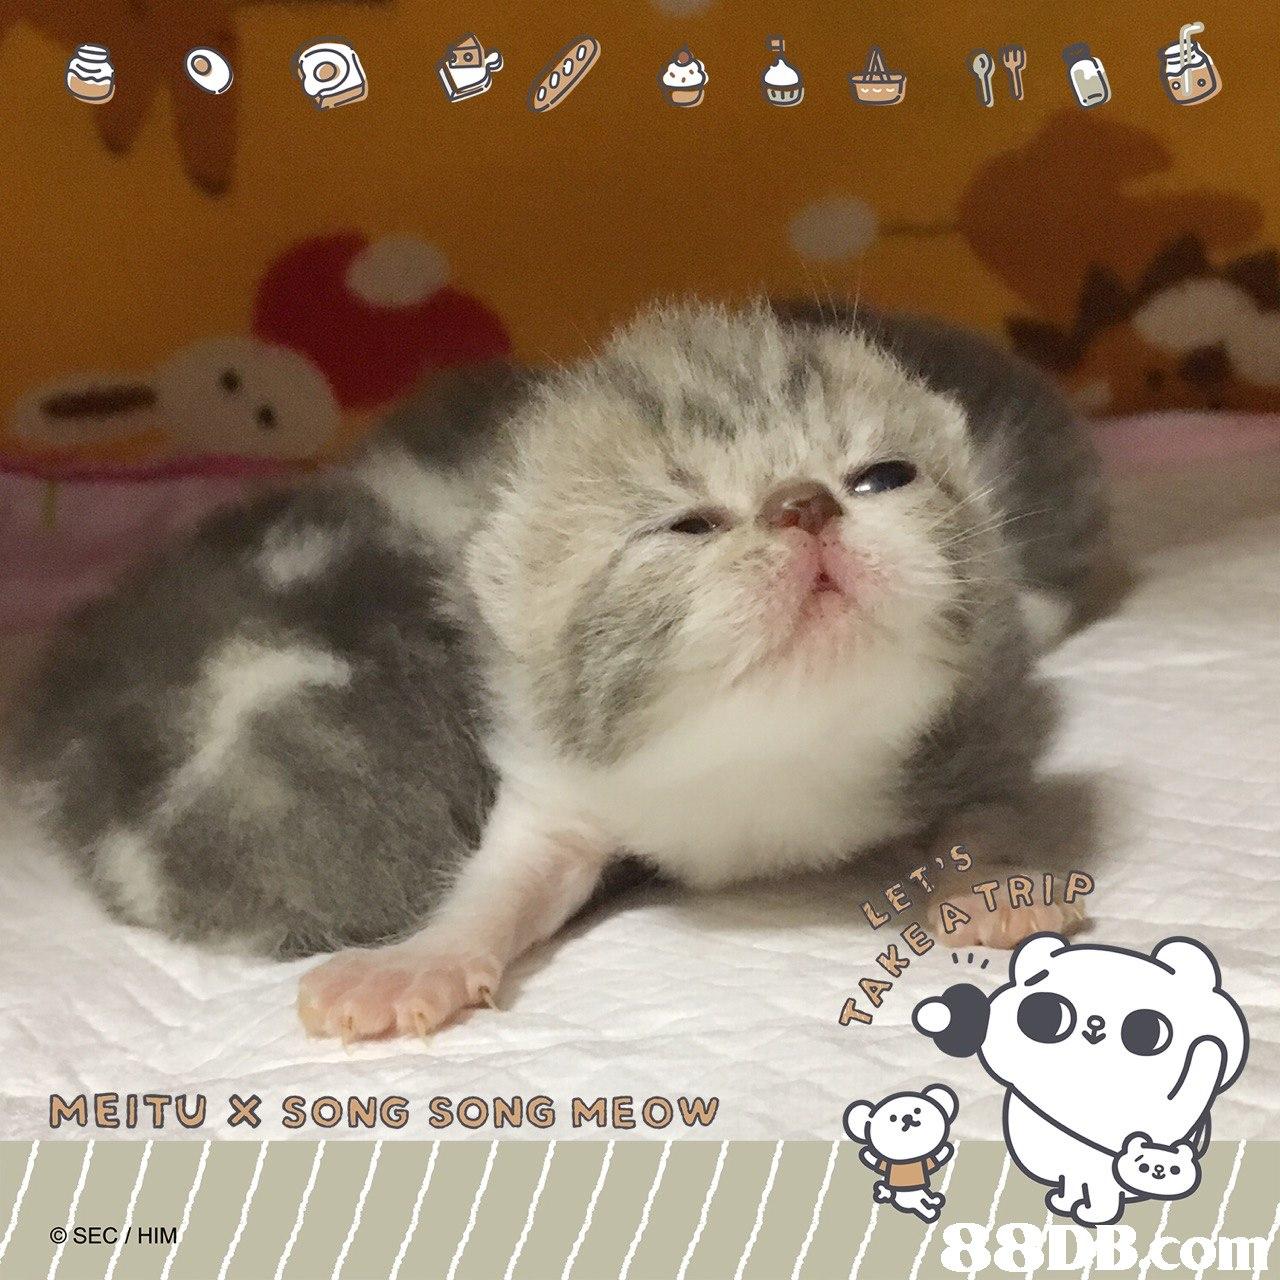 O lo MEITU SONG SONG MEOWw © SEC / HIM  Cat,Mammal,Vertebrate,Small to medium-sized cats,Felidae